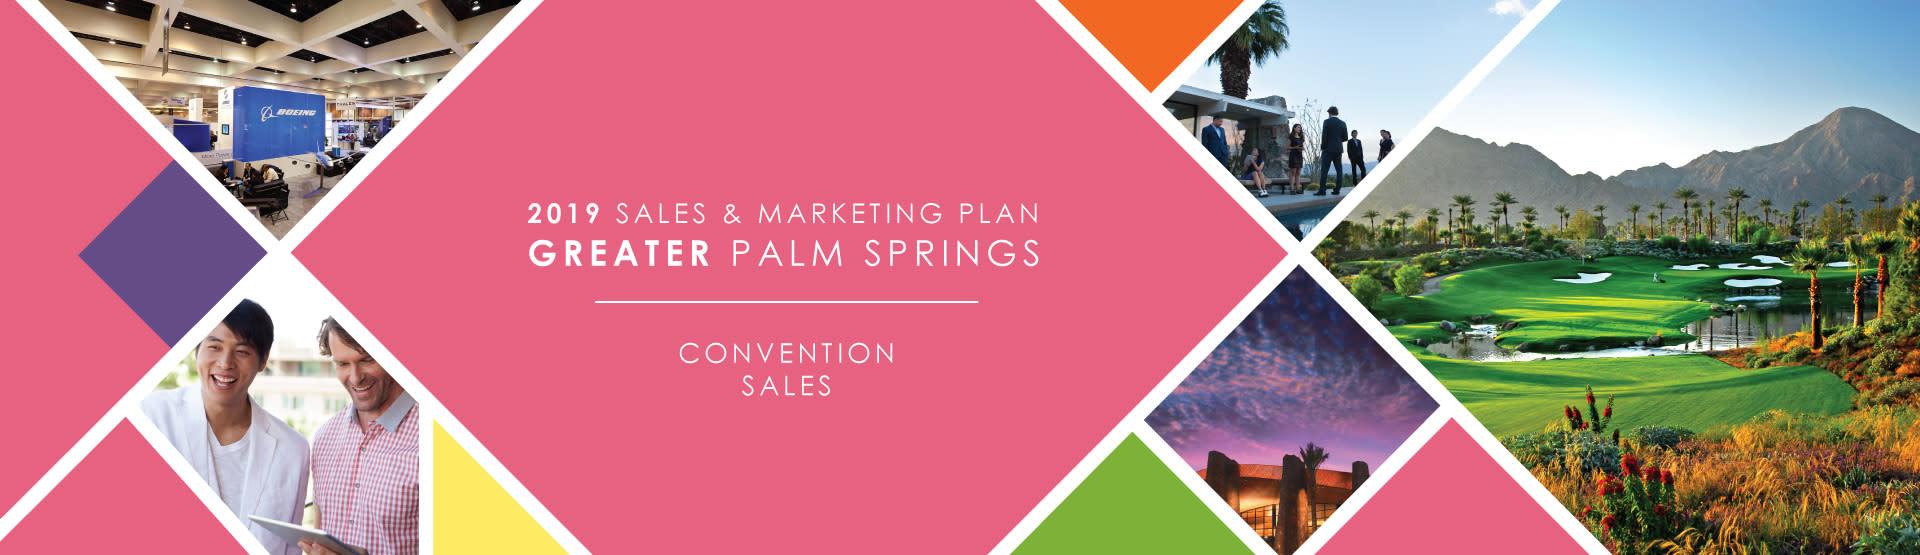 Convention Sales Header